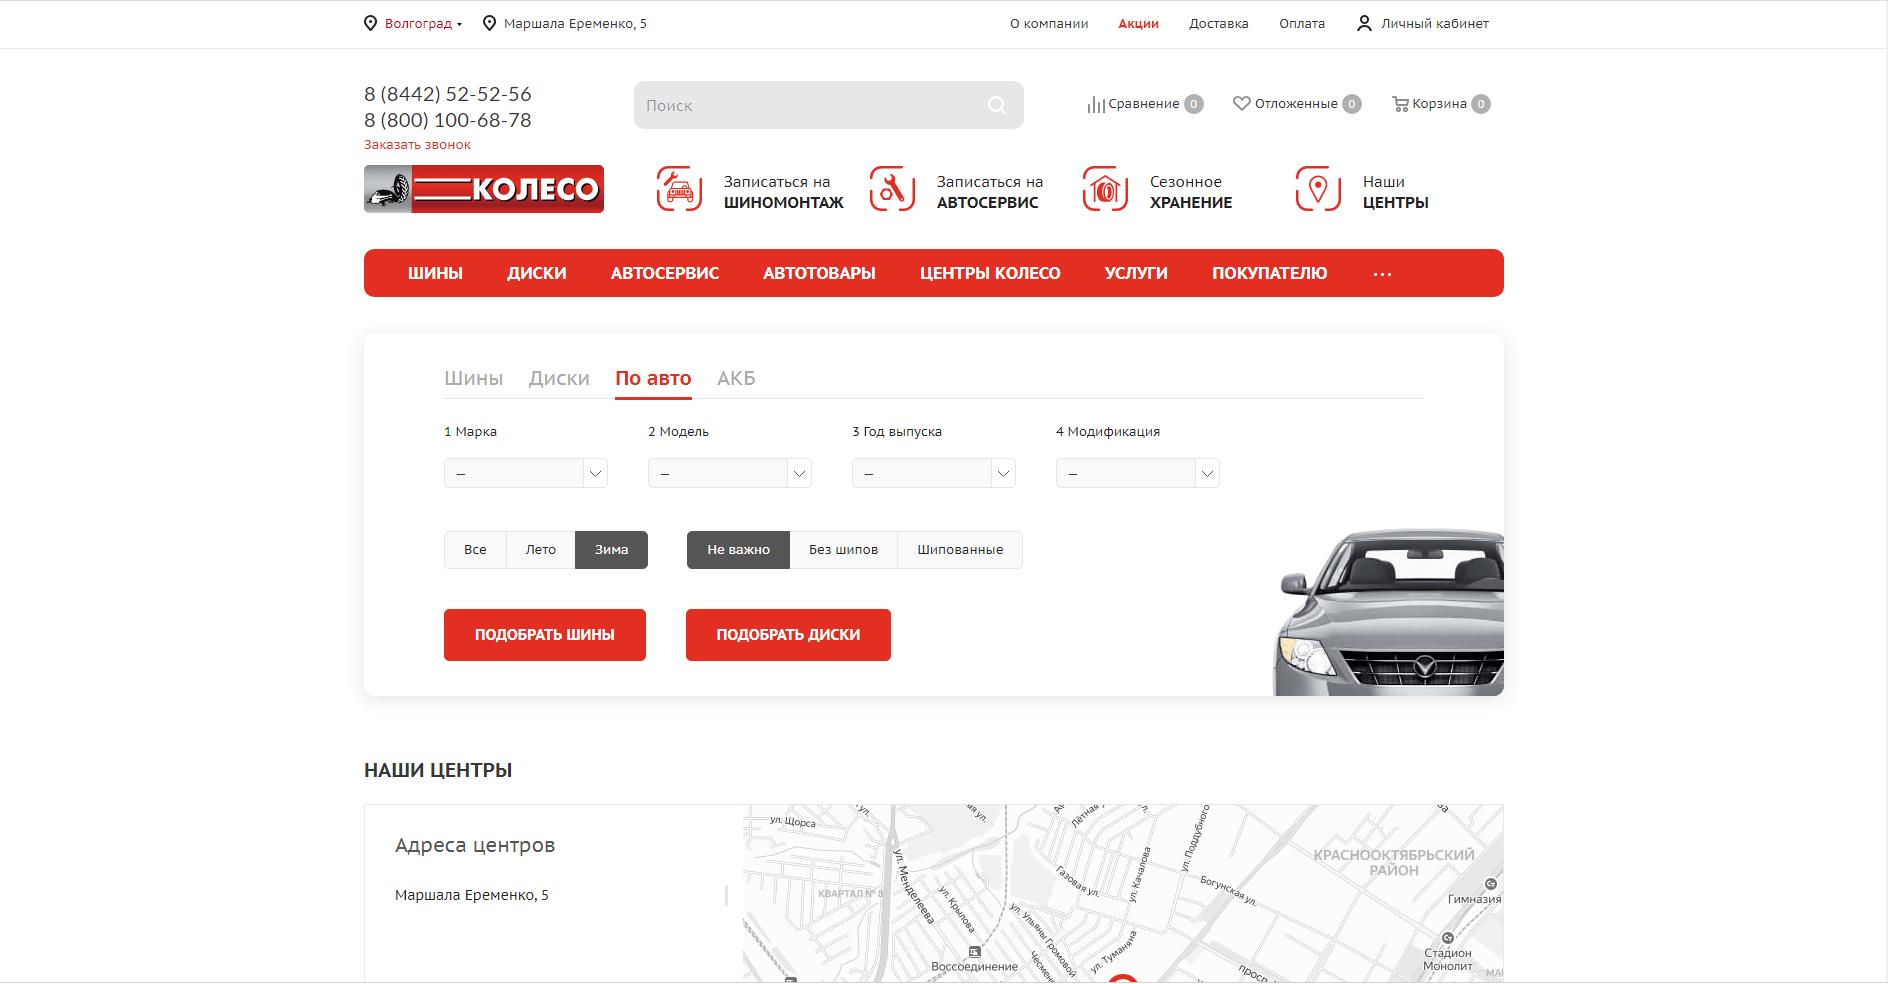 koleso.ru website